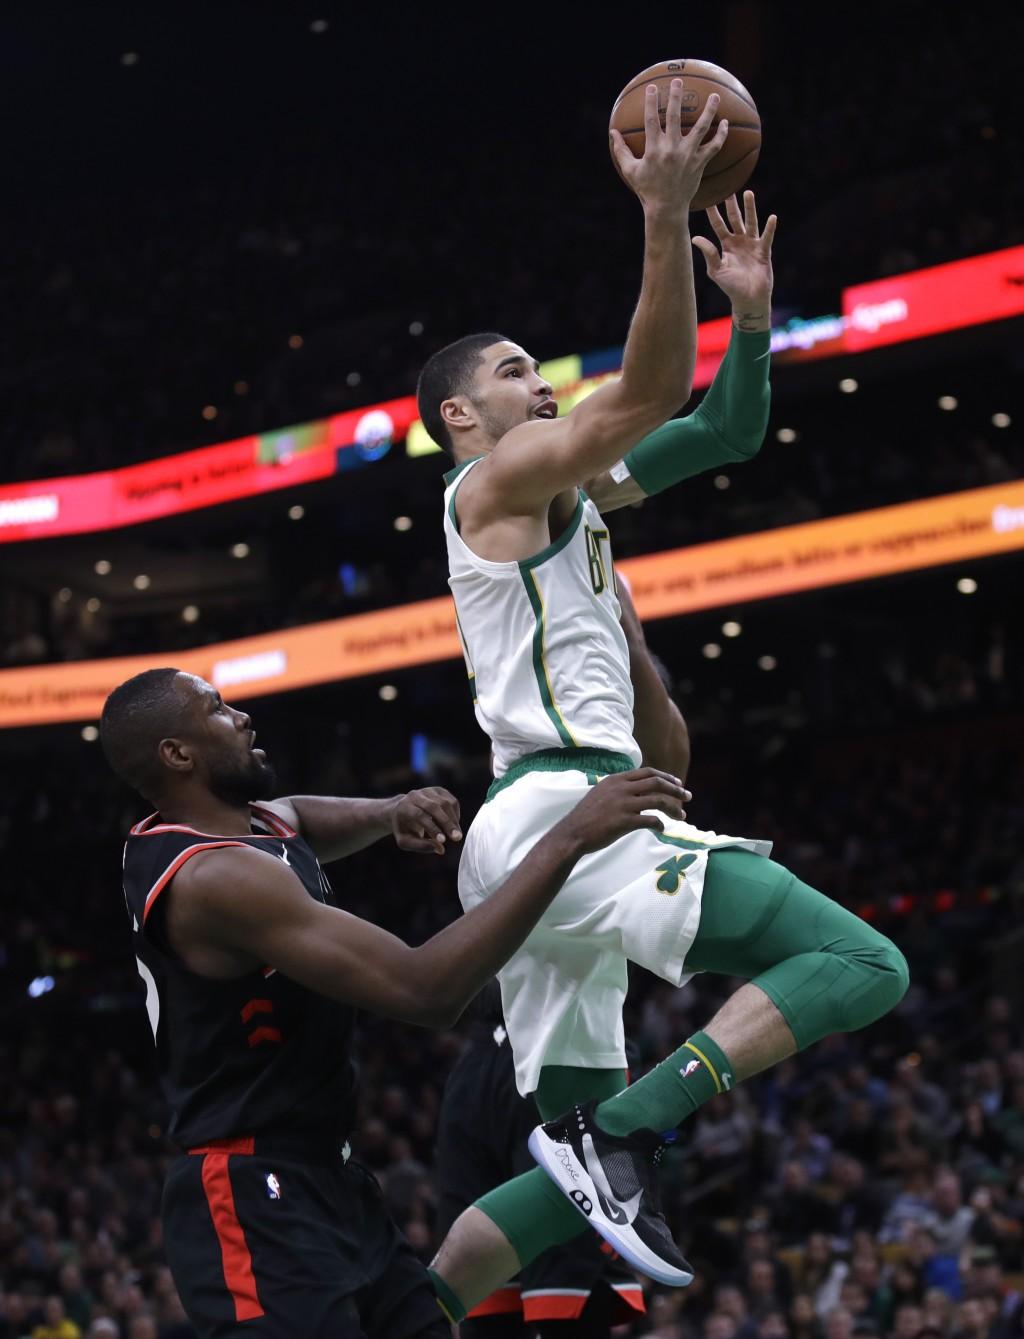 Boston Celtics forward Jayson Tatum, right, drives to the basket past Toronto Raptors forward Serge Ibaka, left, during the first quarter of an NBA ba